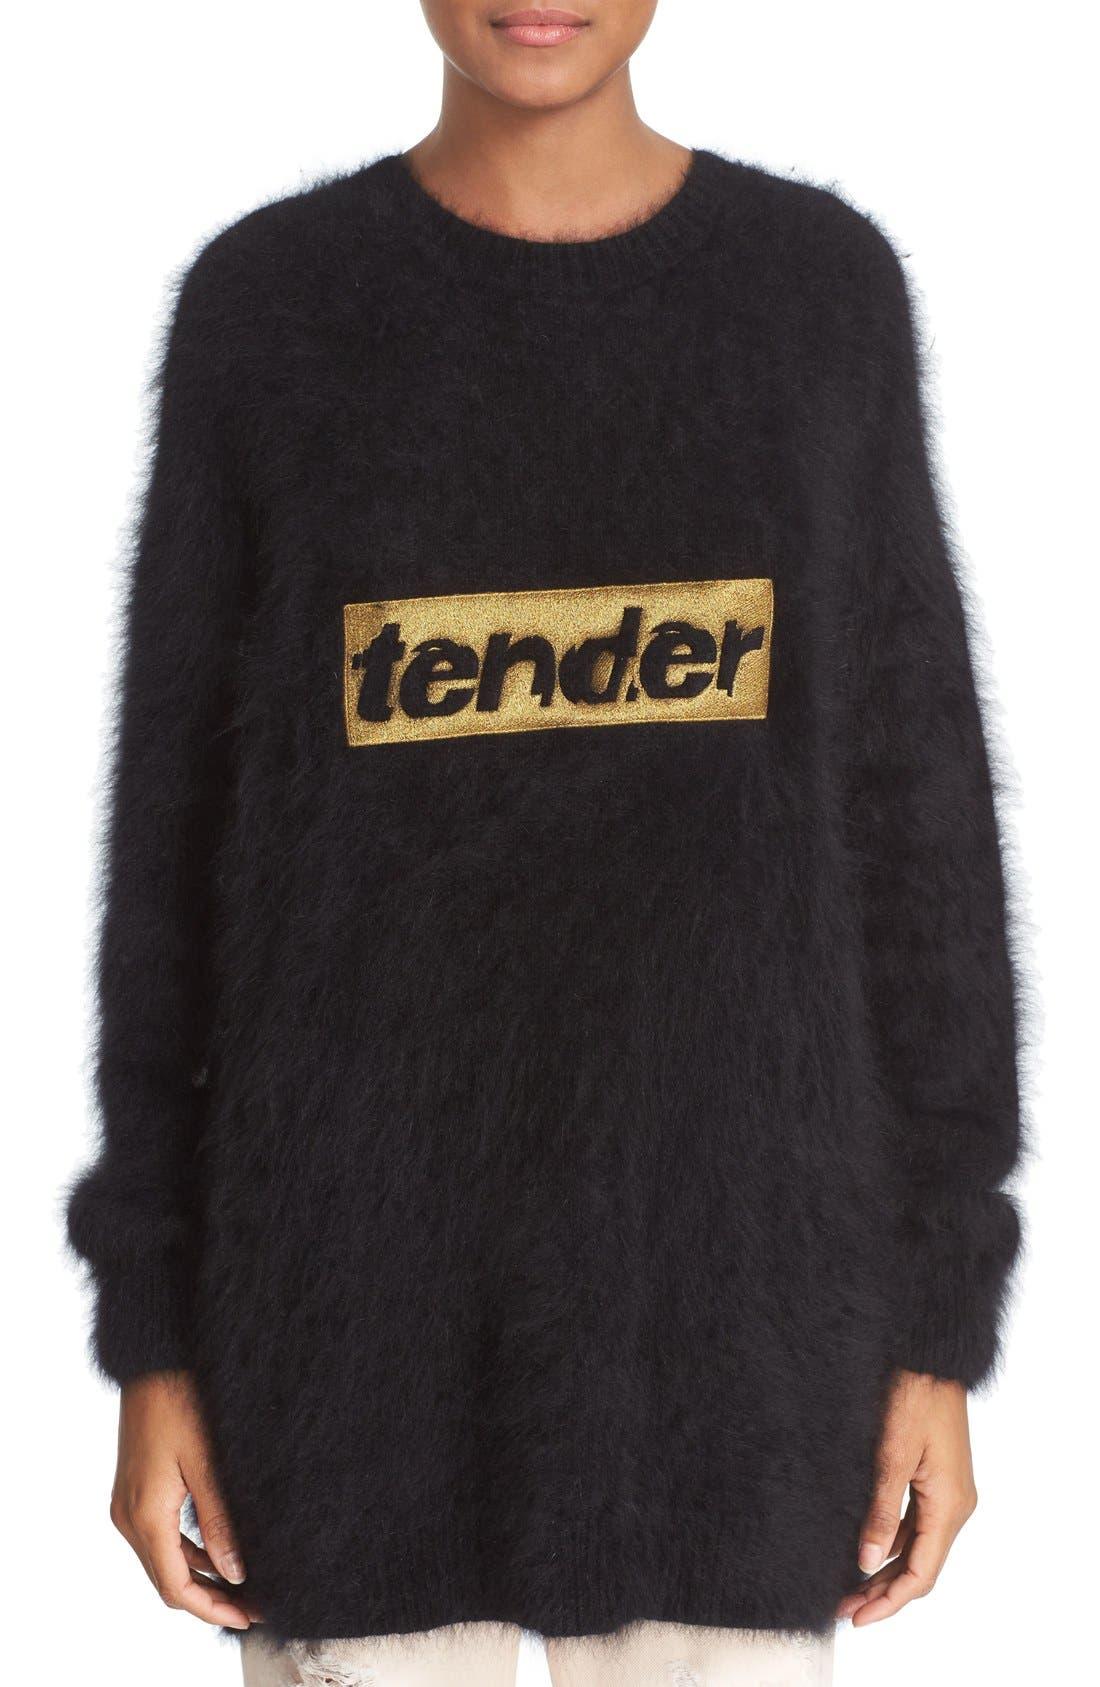 Alternate Image 1  - Alexander Wang 'Tender' Embroidered Wool Blend Sweater